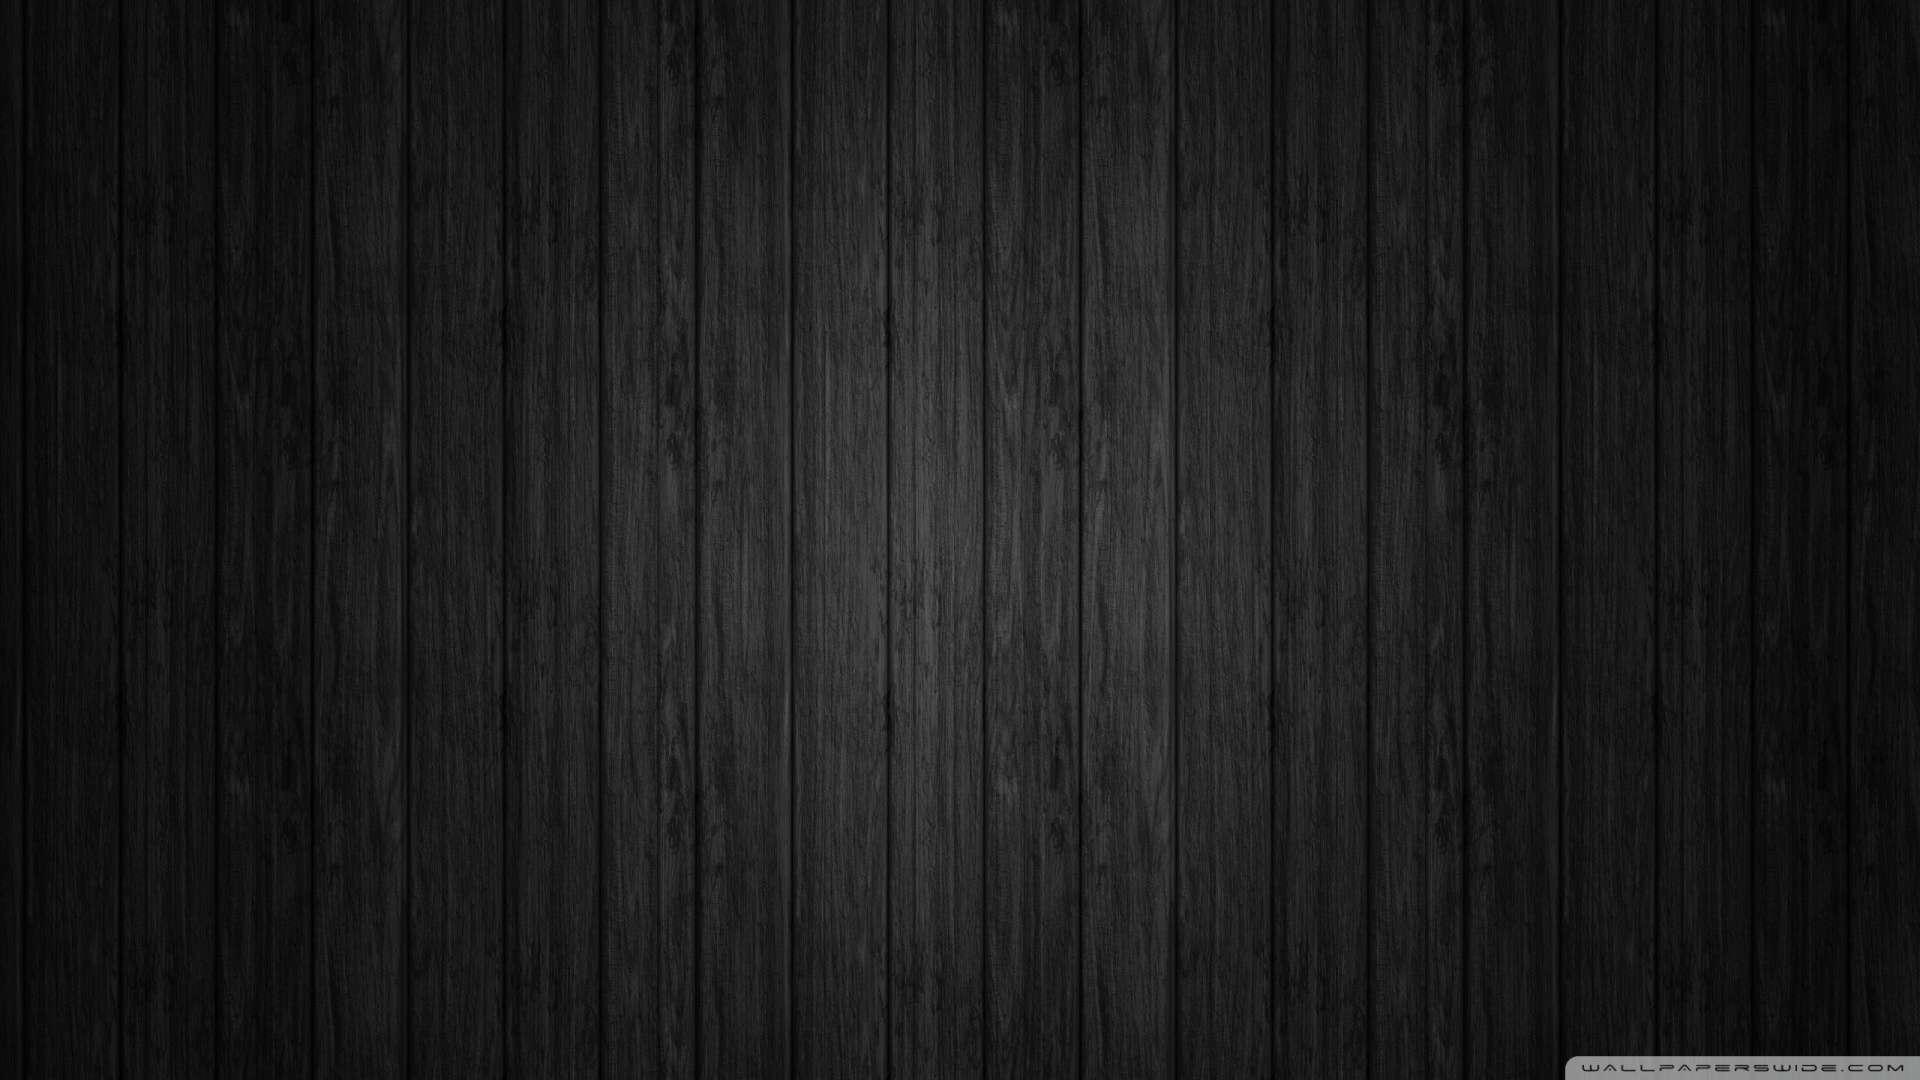 wallpaper black background wood 1080p hd upload at 1920x1080 black wood floor wallpaper67 floor